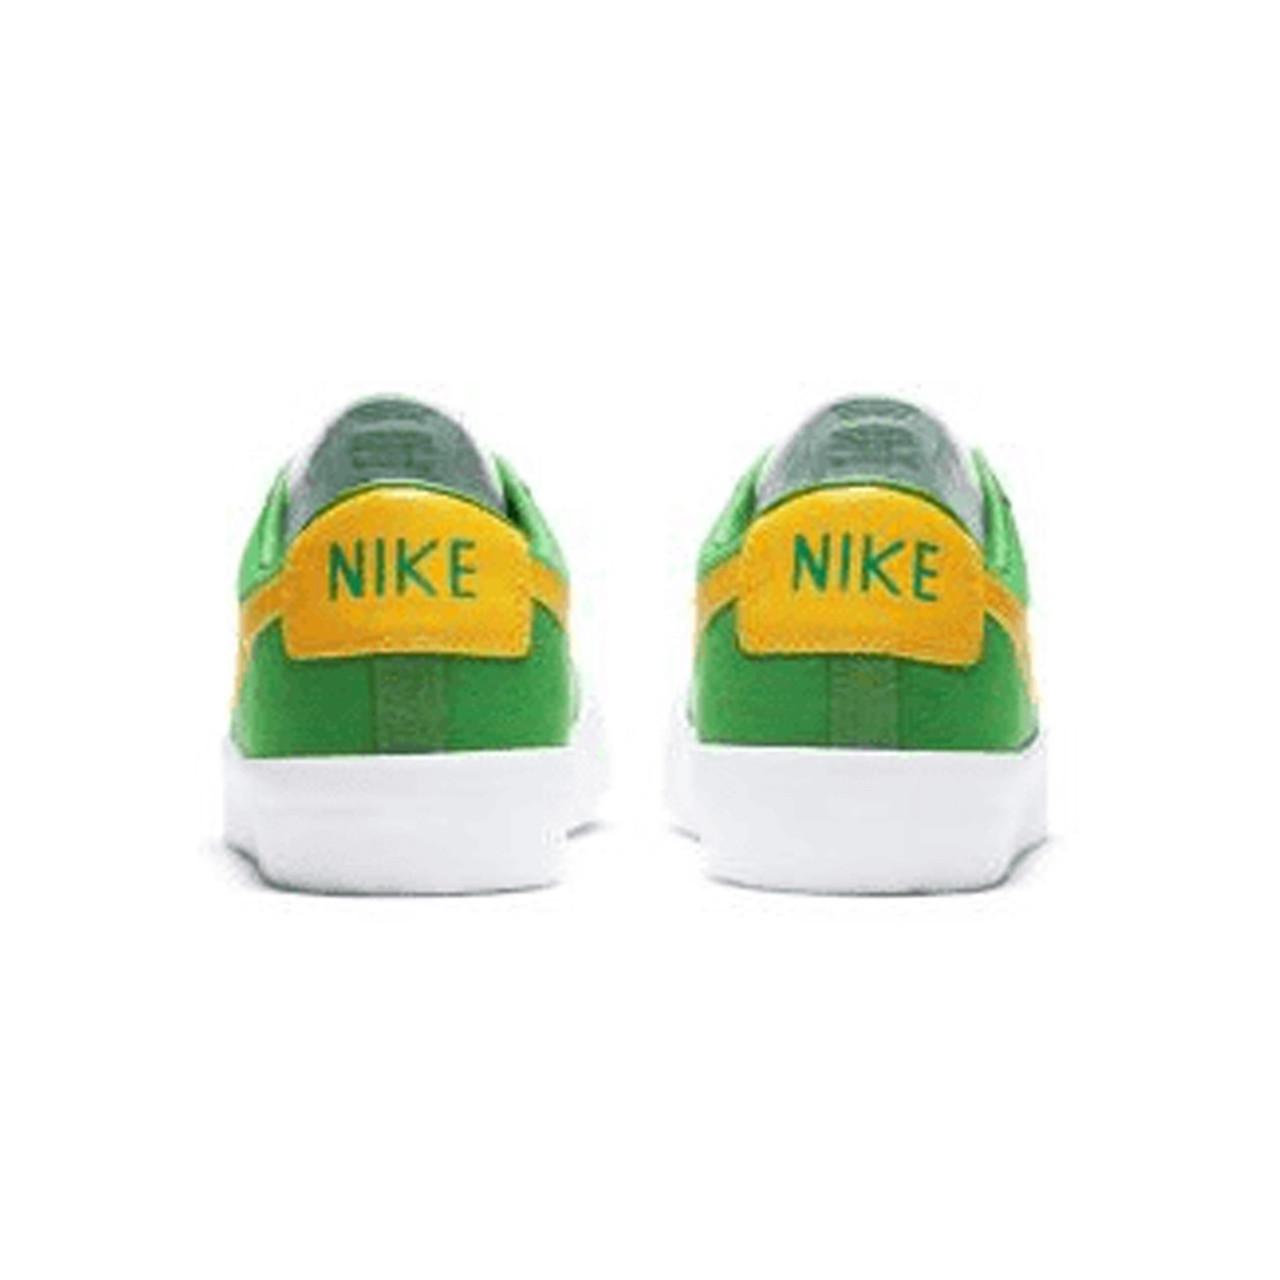 NIKE SB Zoom Blazer Low Pro GT Shoes Lucky Green/University Gold-Black-White